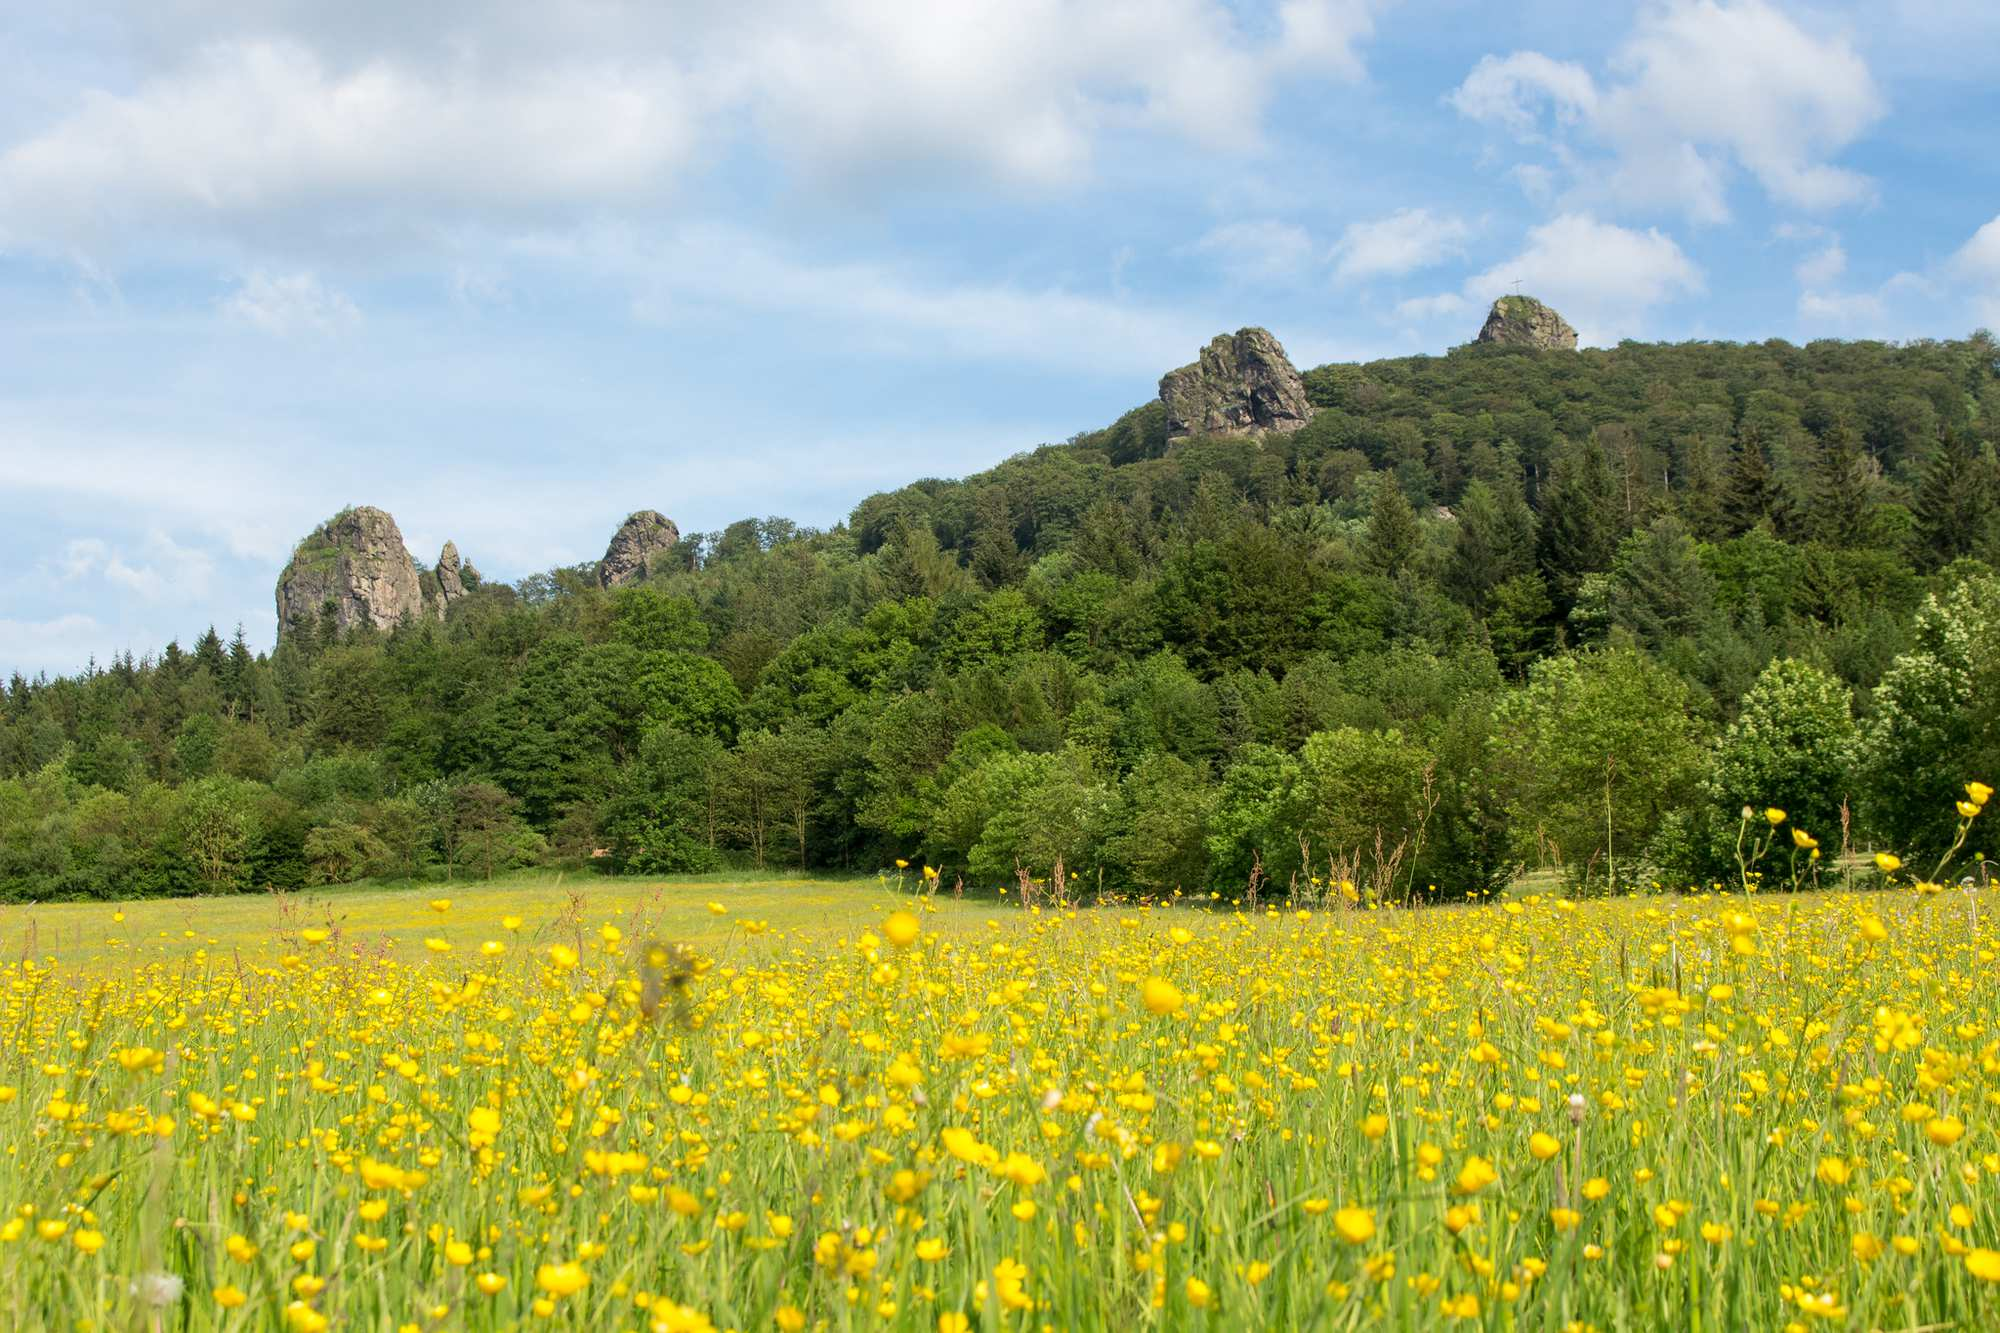 Über die Kämme des Rothaargebirges